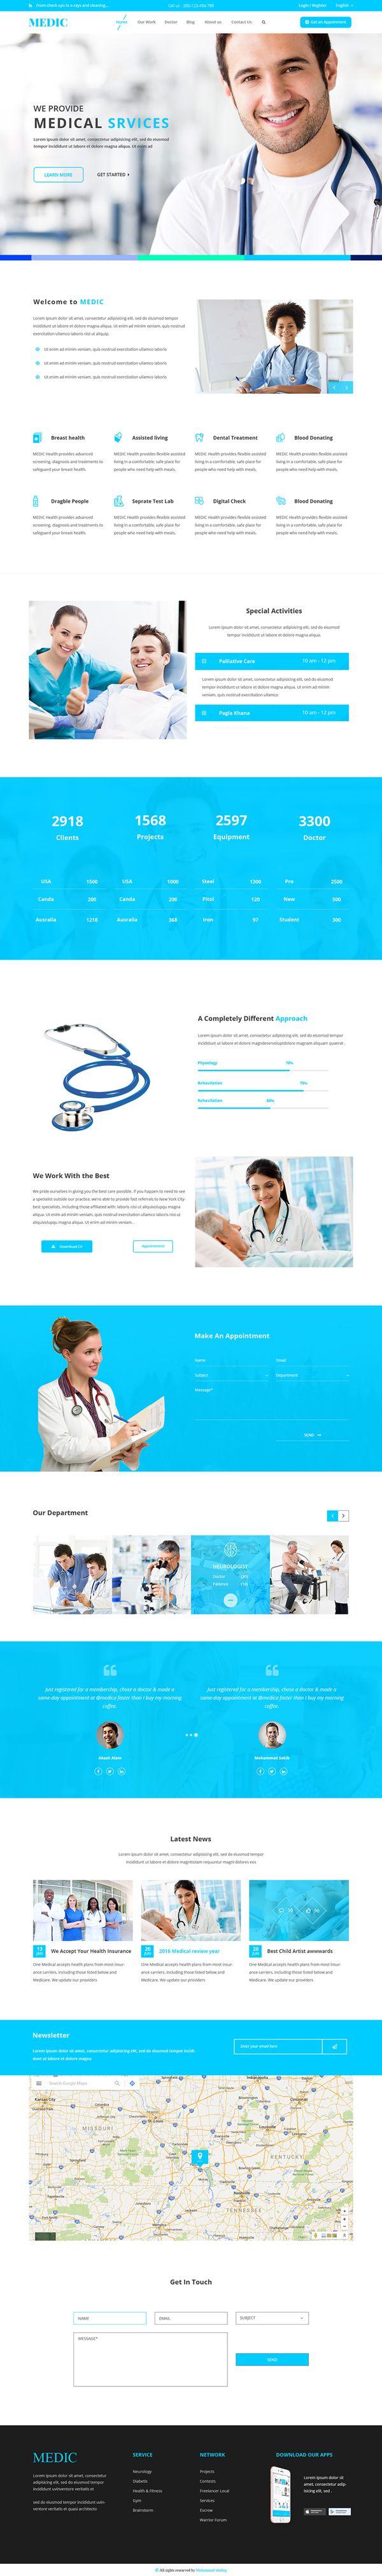 Free Medical Website Template Psd Healthcare Templates Dental